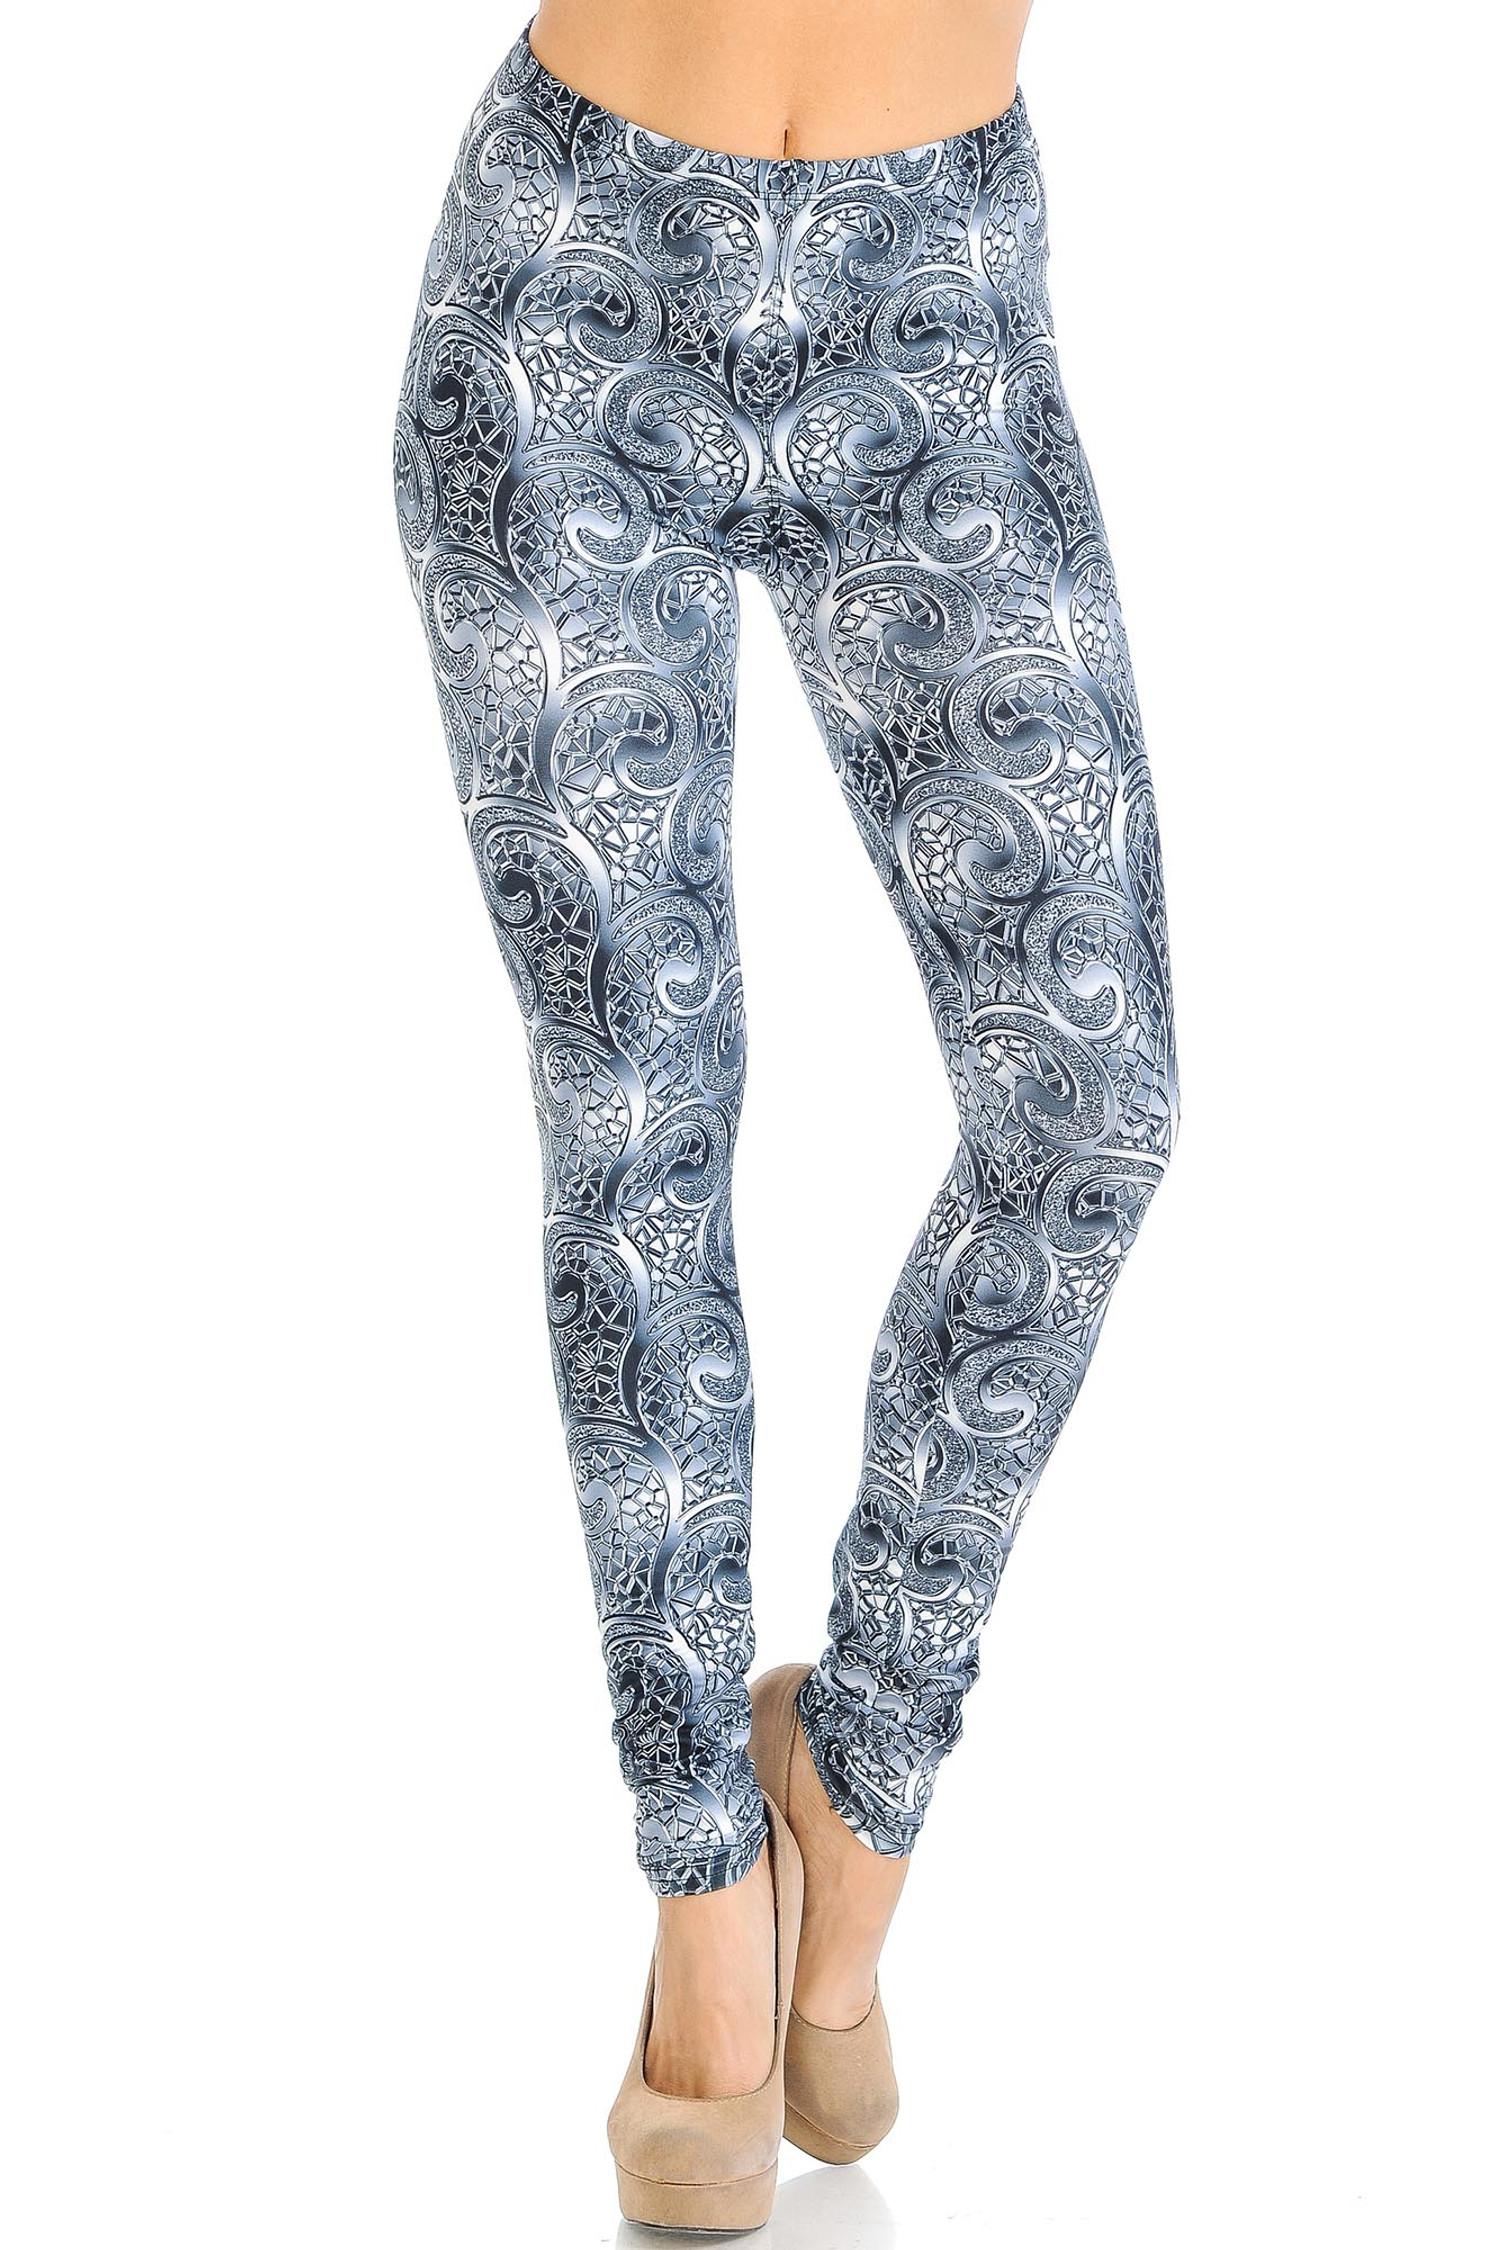 Creamy Soft Swirling Crystal Glass Extra Small Leggings - USA Fashion™